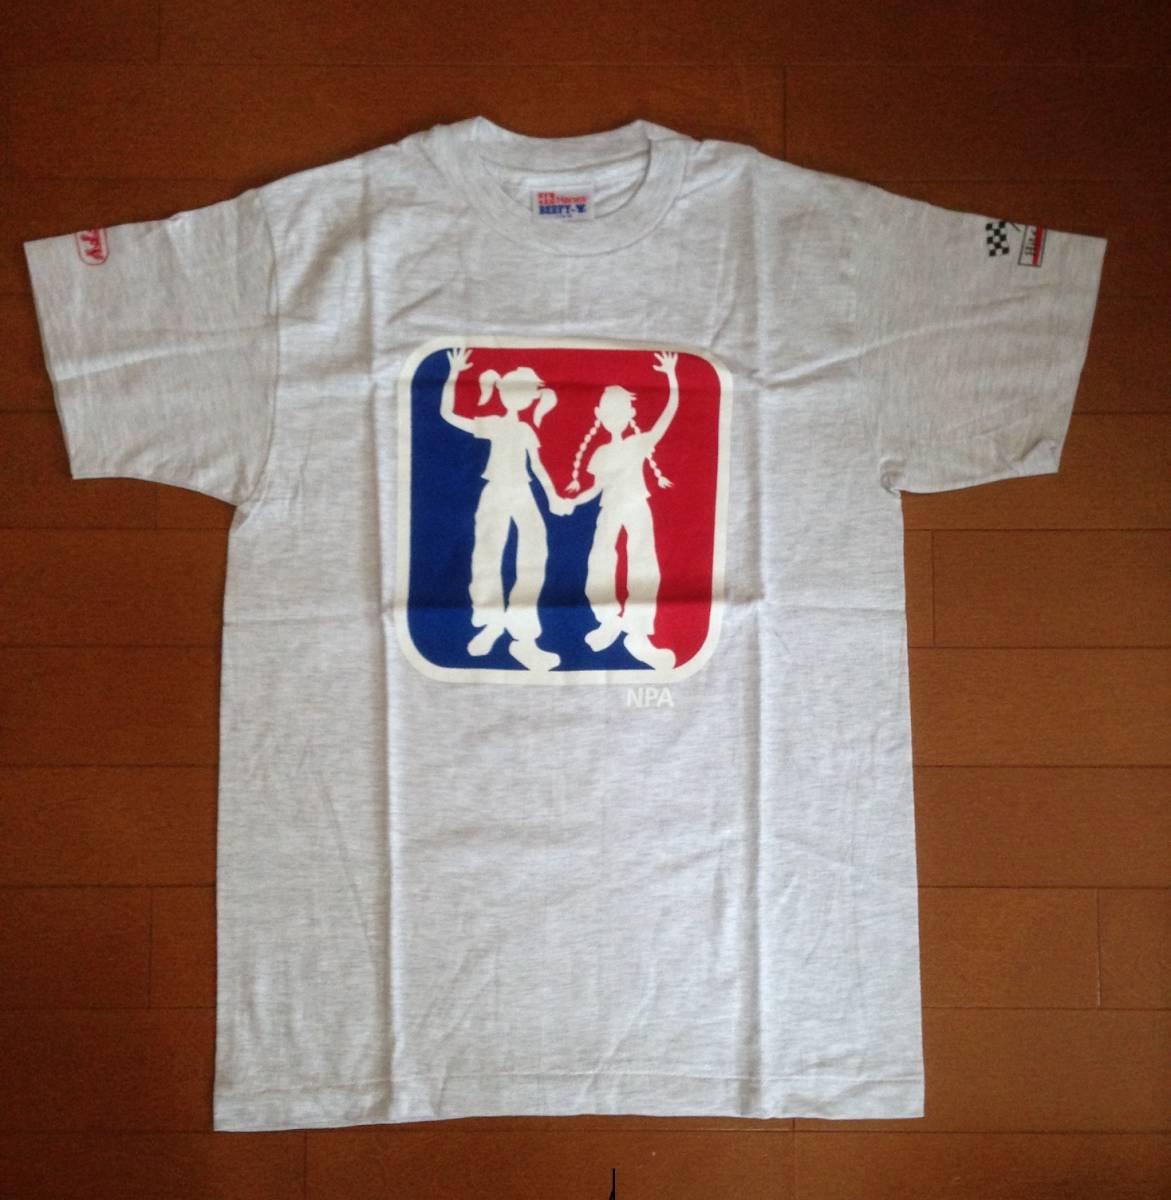 Puffy 記念Tシャツ 1997年全国ツアーの時の販売グッズ 女性用L 新品未使用品